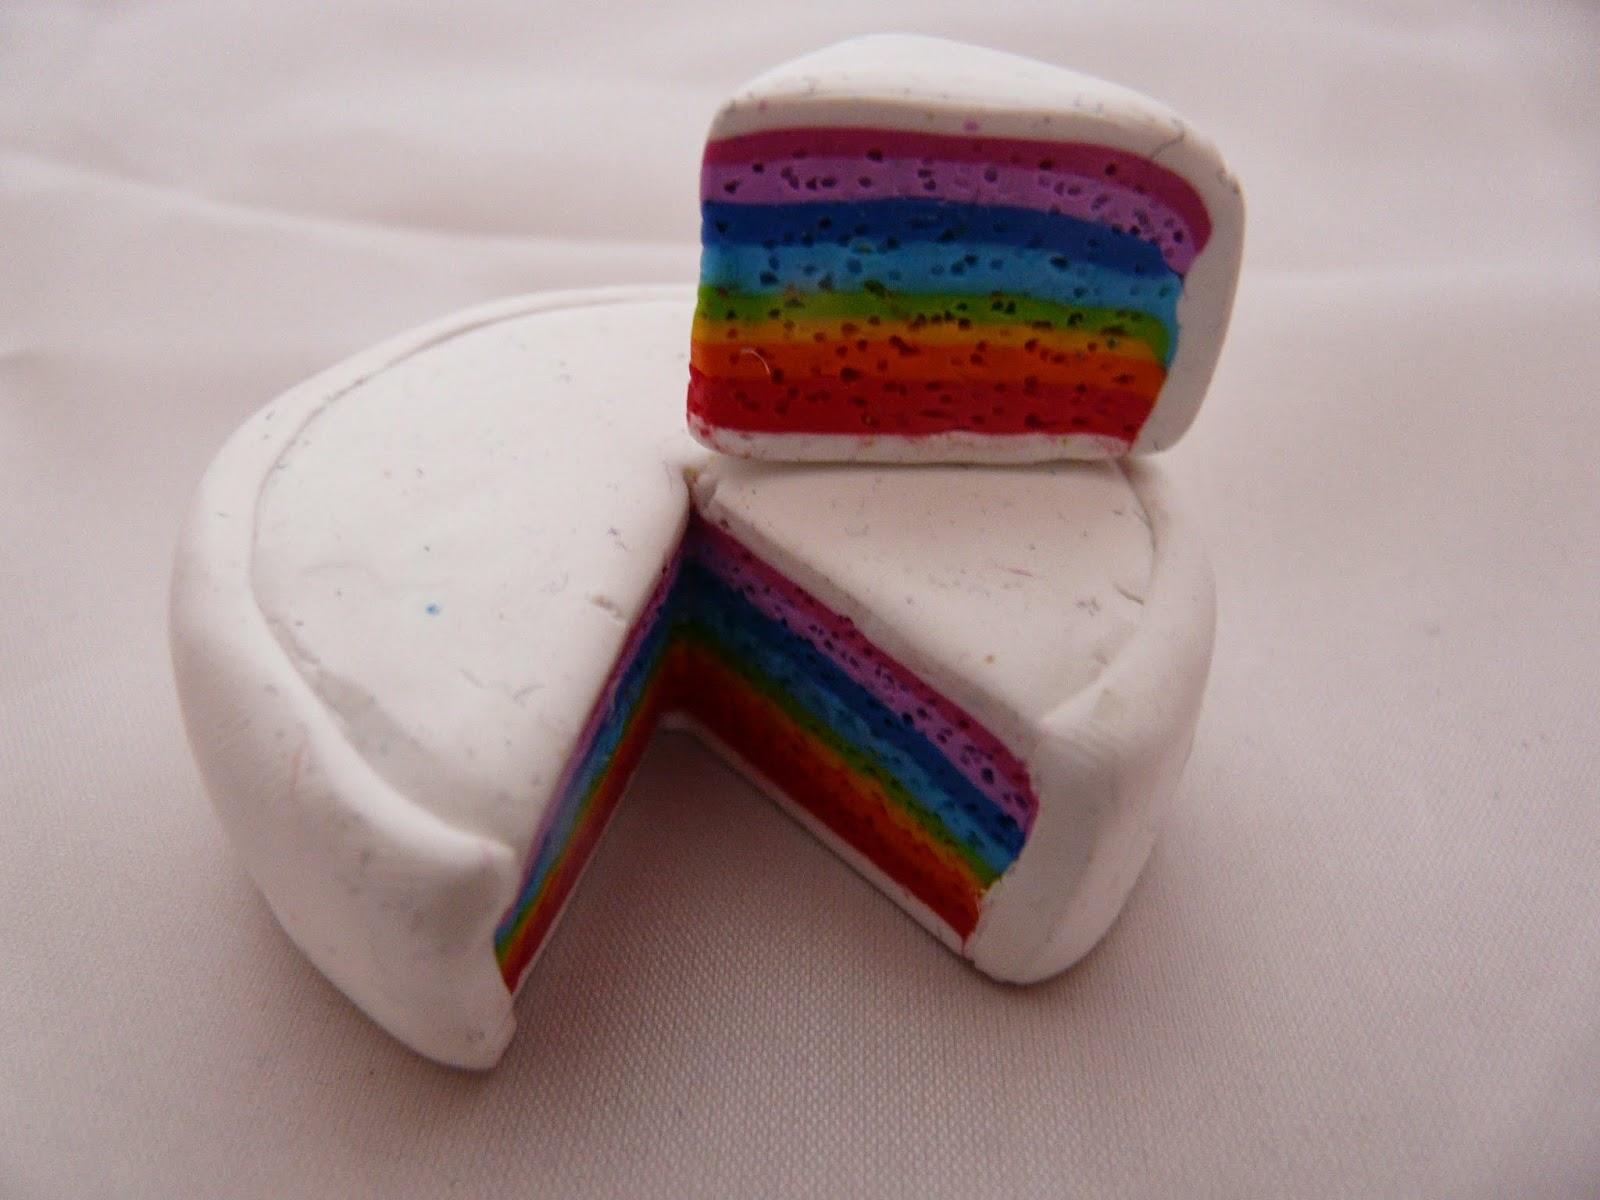 les cr as tutos tuto fimo comment faire un rainbow cake. Black Bedroom Furniture Sets. Home Design Ideas